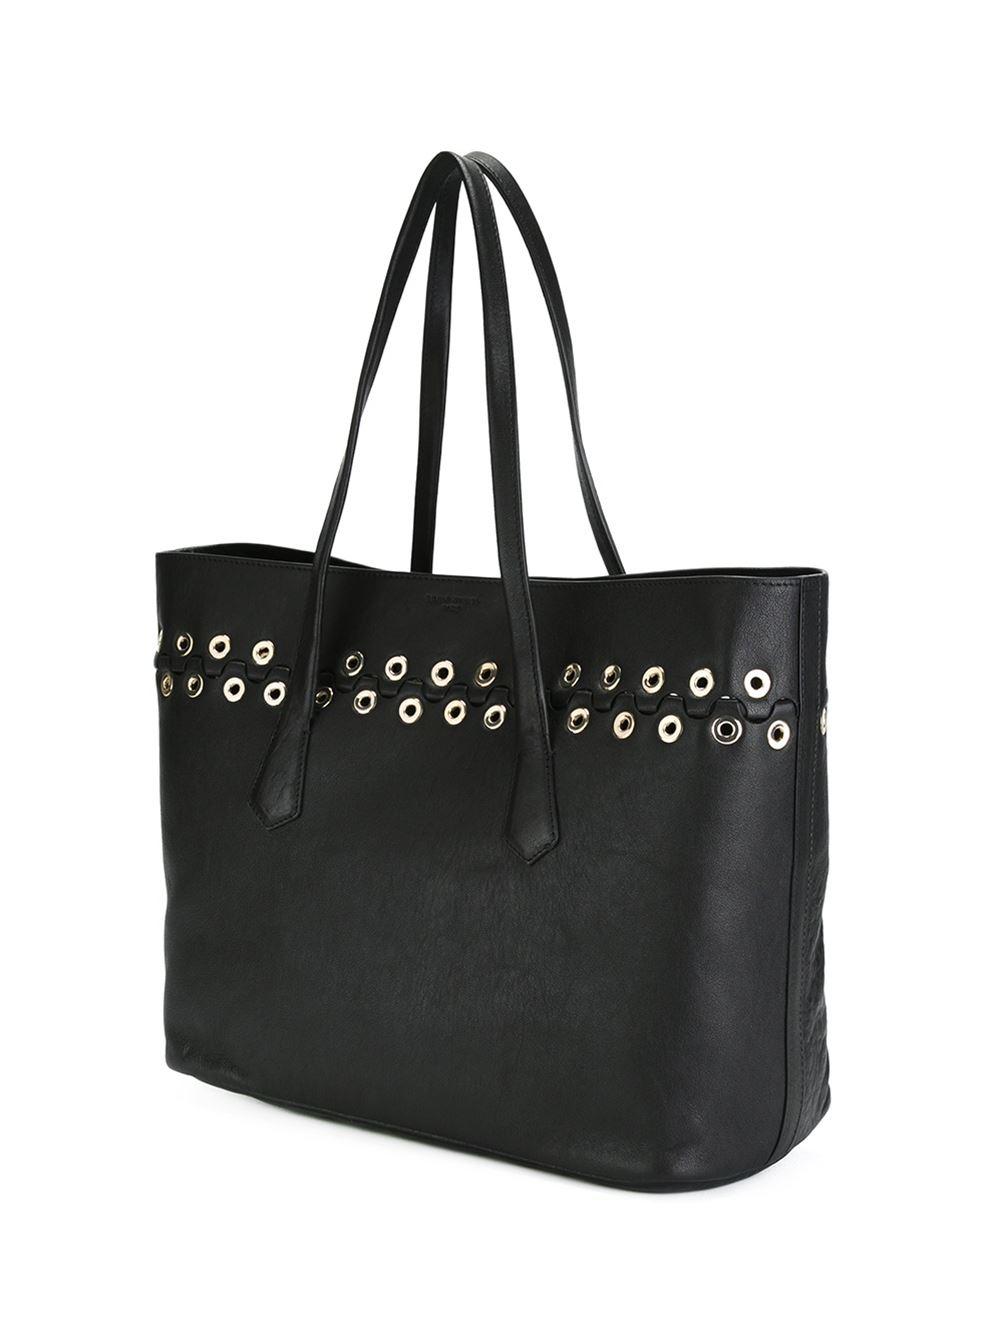 Sonia Rykiel Eyelet Embellished Shopping Tote in Black